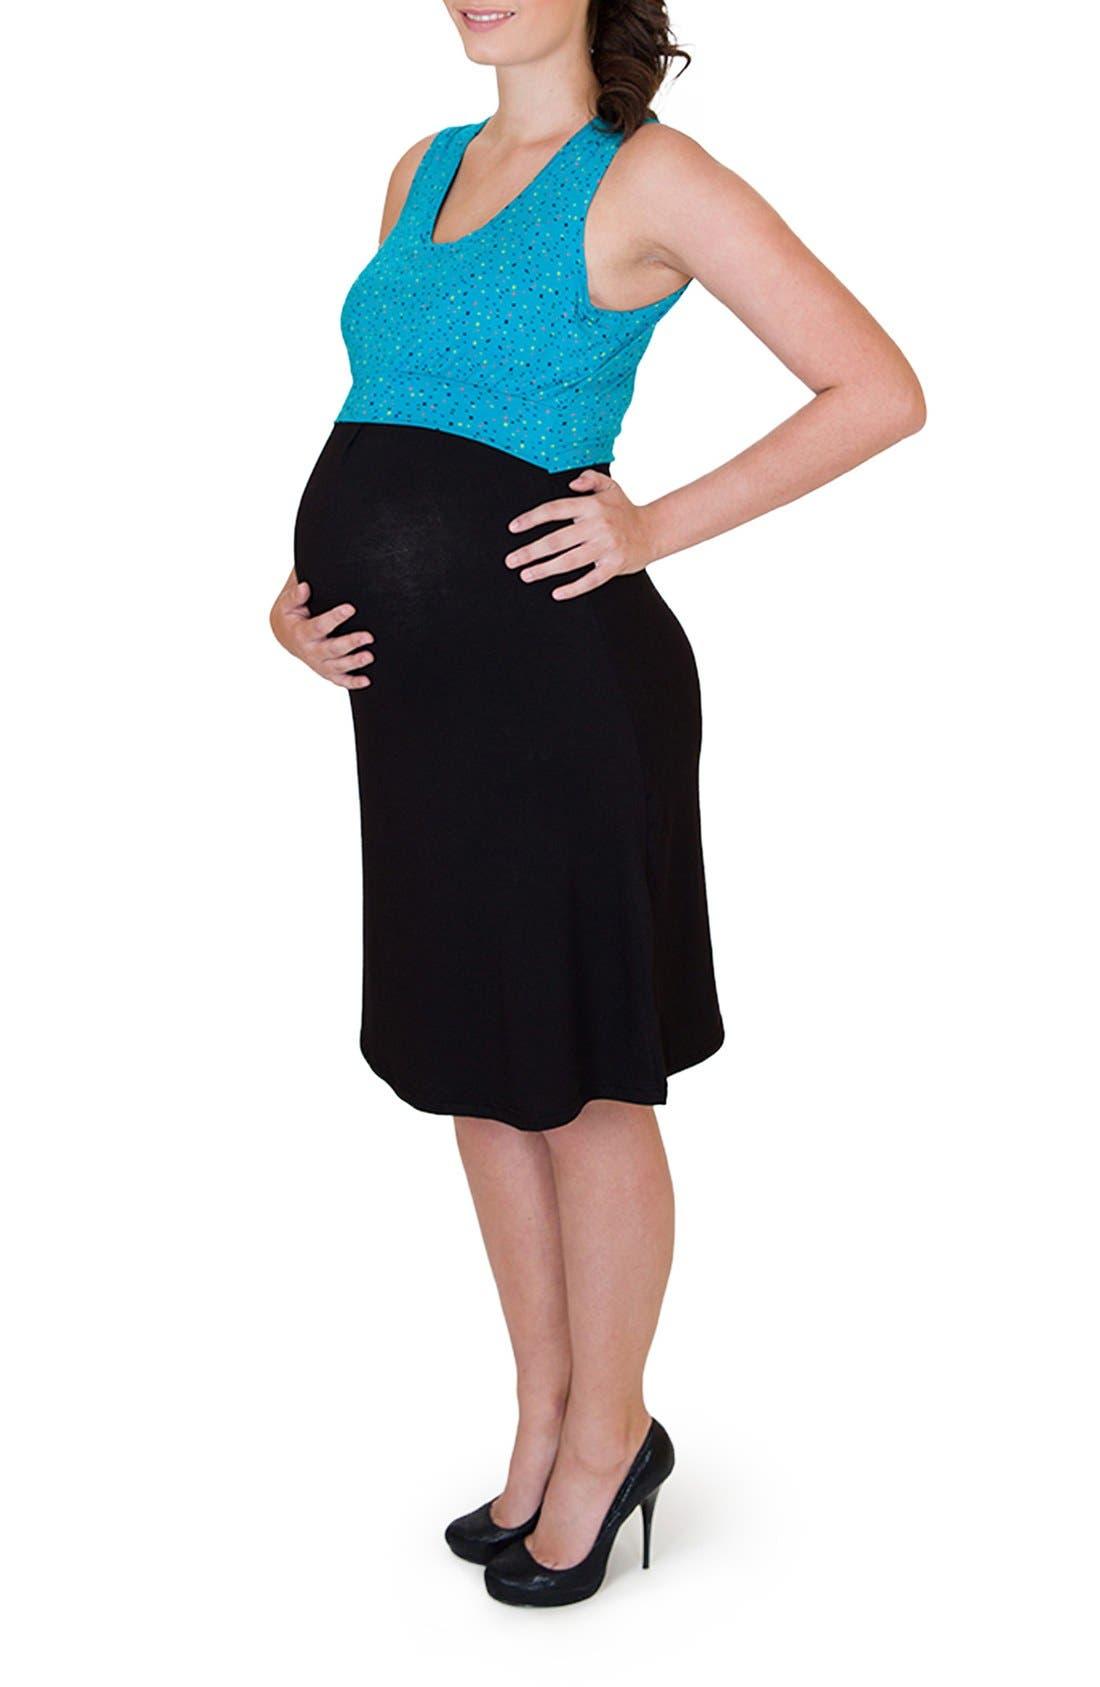 'Ana' Maternity/Nursing Dress,                             Alternate thumbnail 3, color,                             DOTS TOP W/ BLACK SKIRT